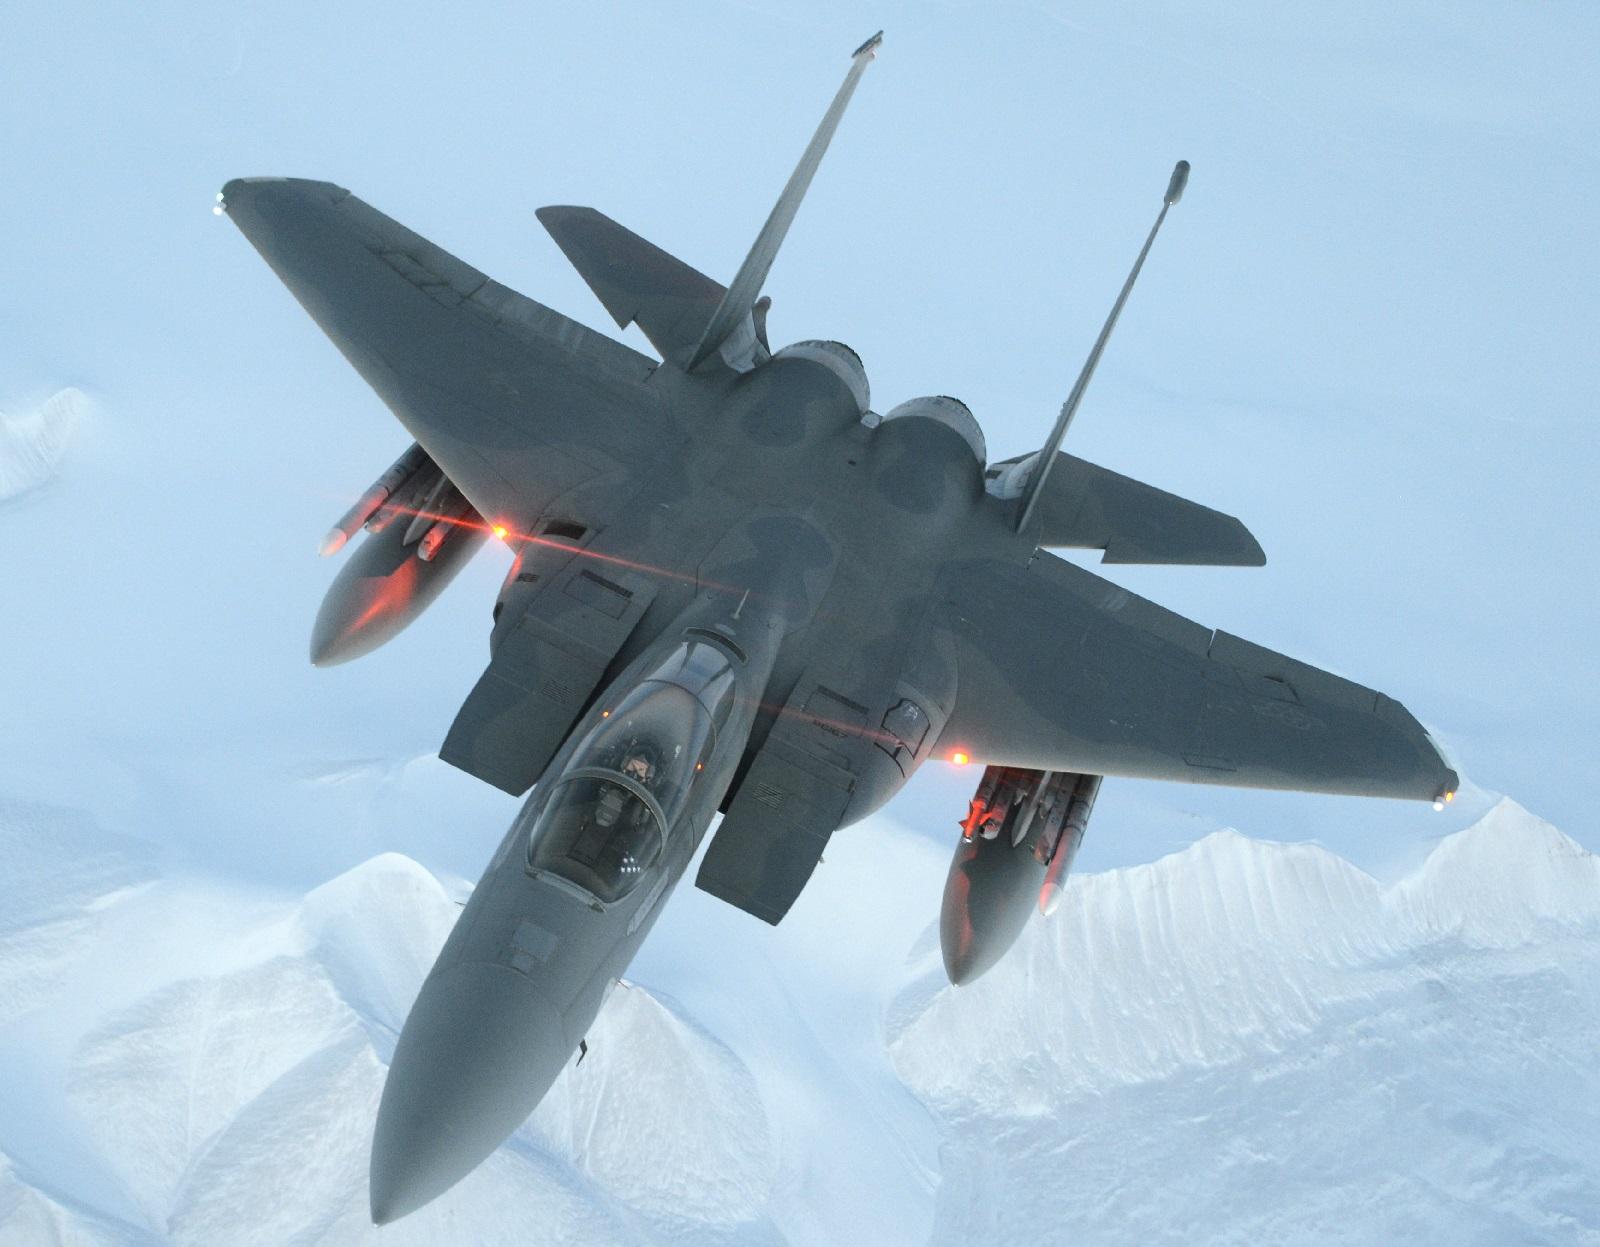 North Korea Nightmare: 5 Ways the U.S. Air Force Could Strike Kim